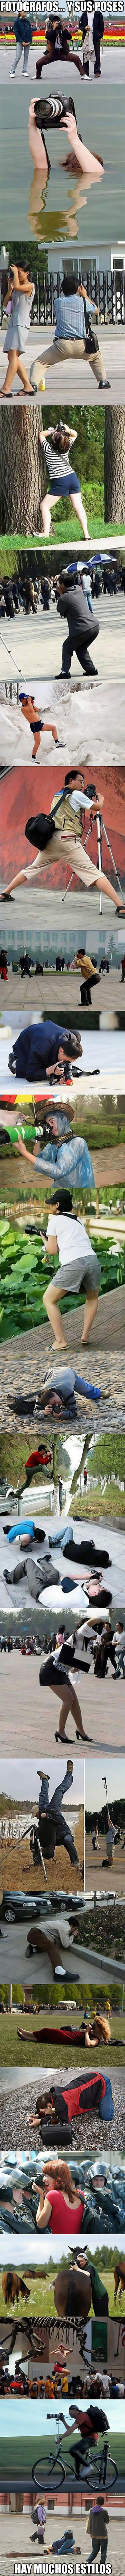 Meme_otros - Ser fotógrafo no es fácil